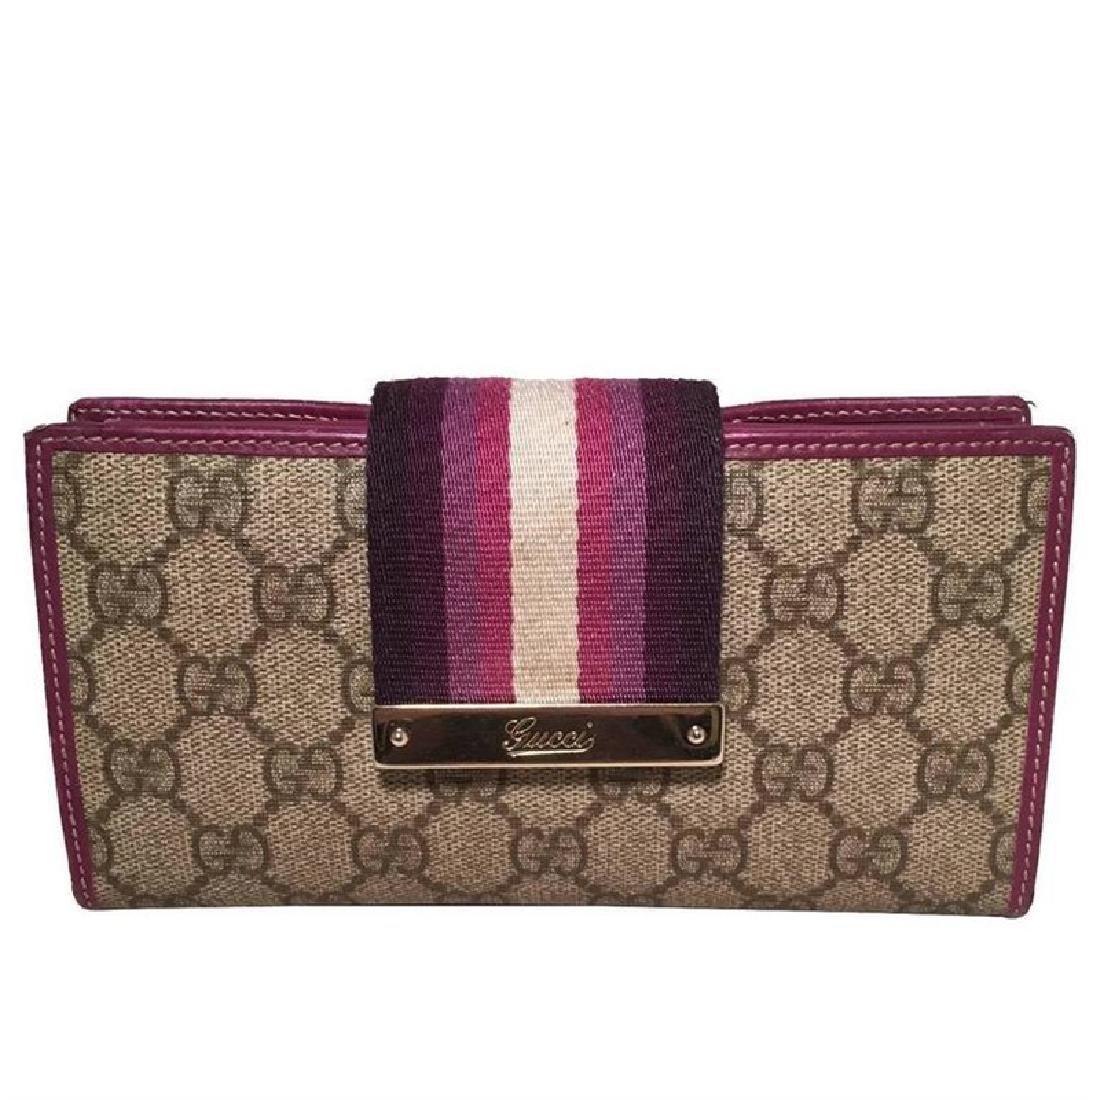 Gucci Monogram Purple Striped Canvas Wallet